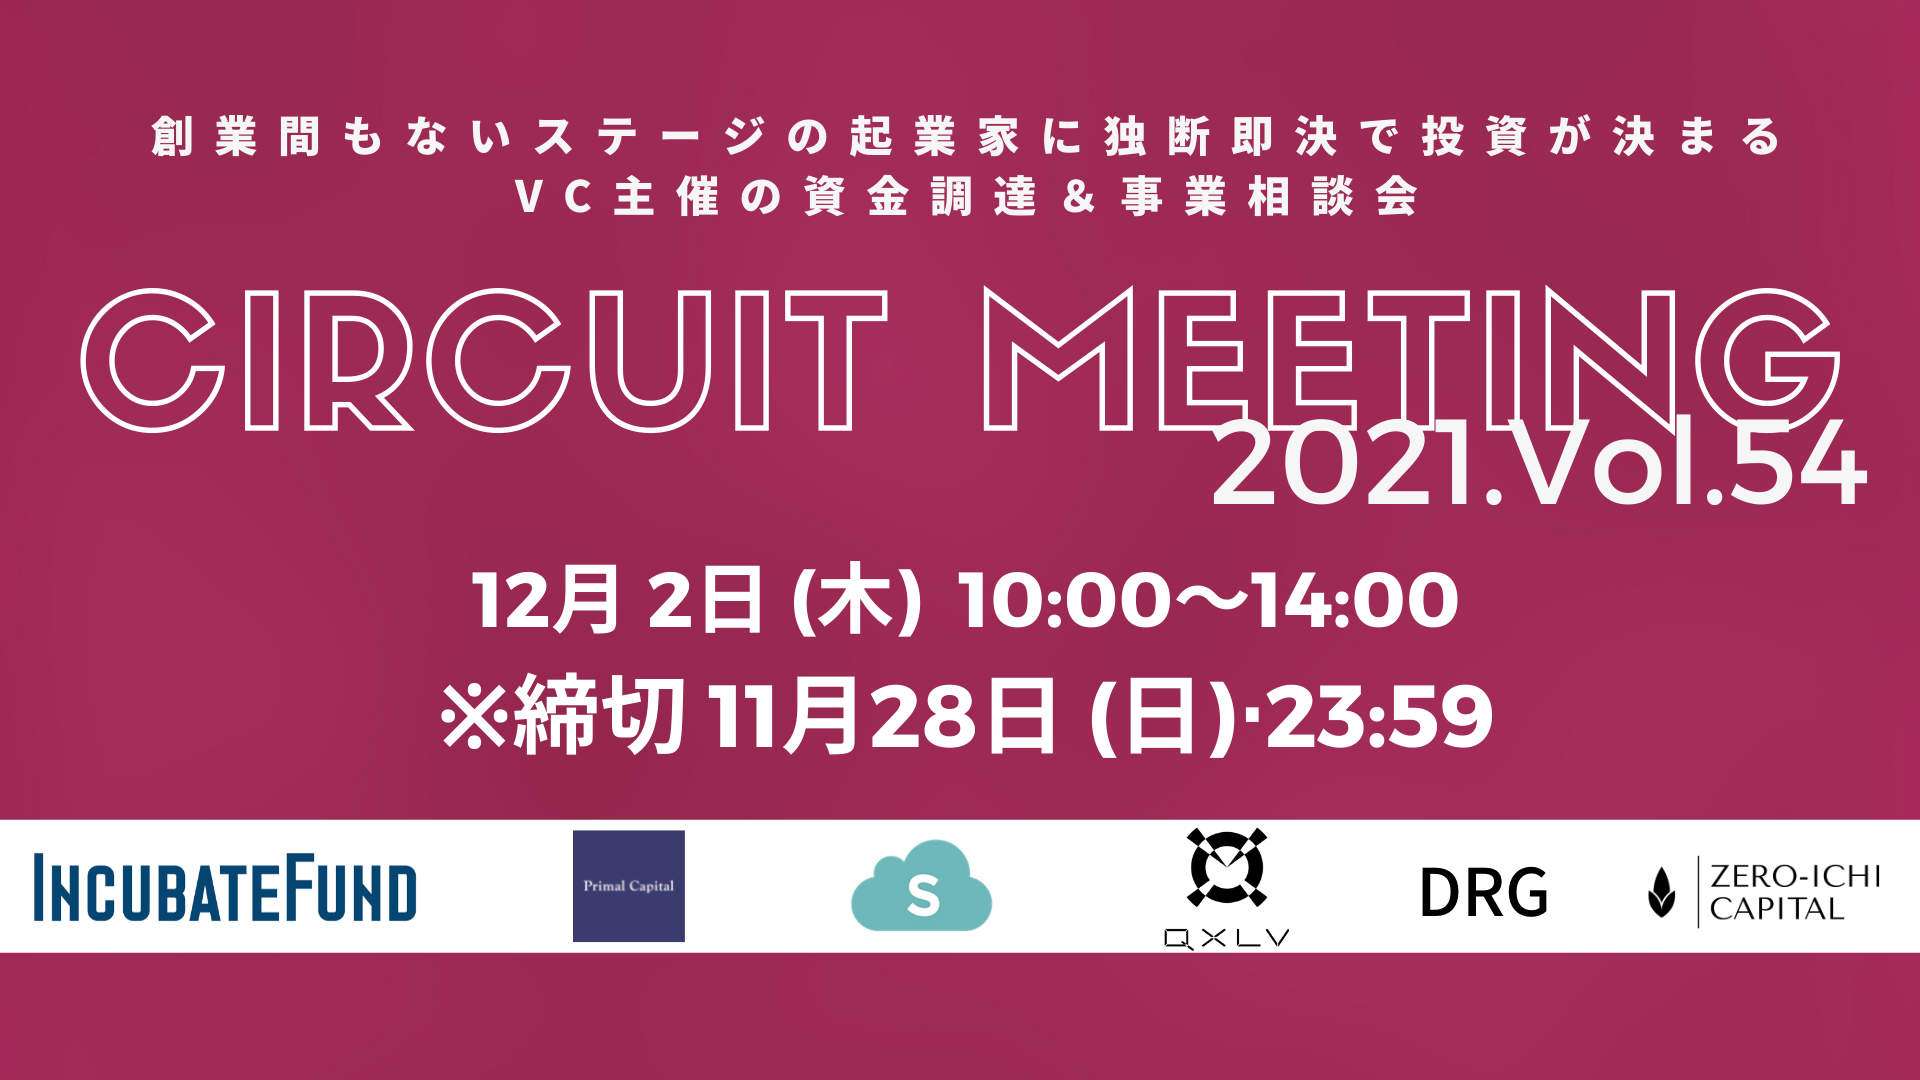 【11/28締切】Circuit Meeting Vol.54